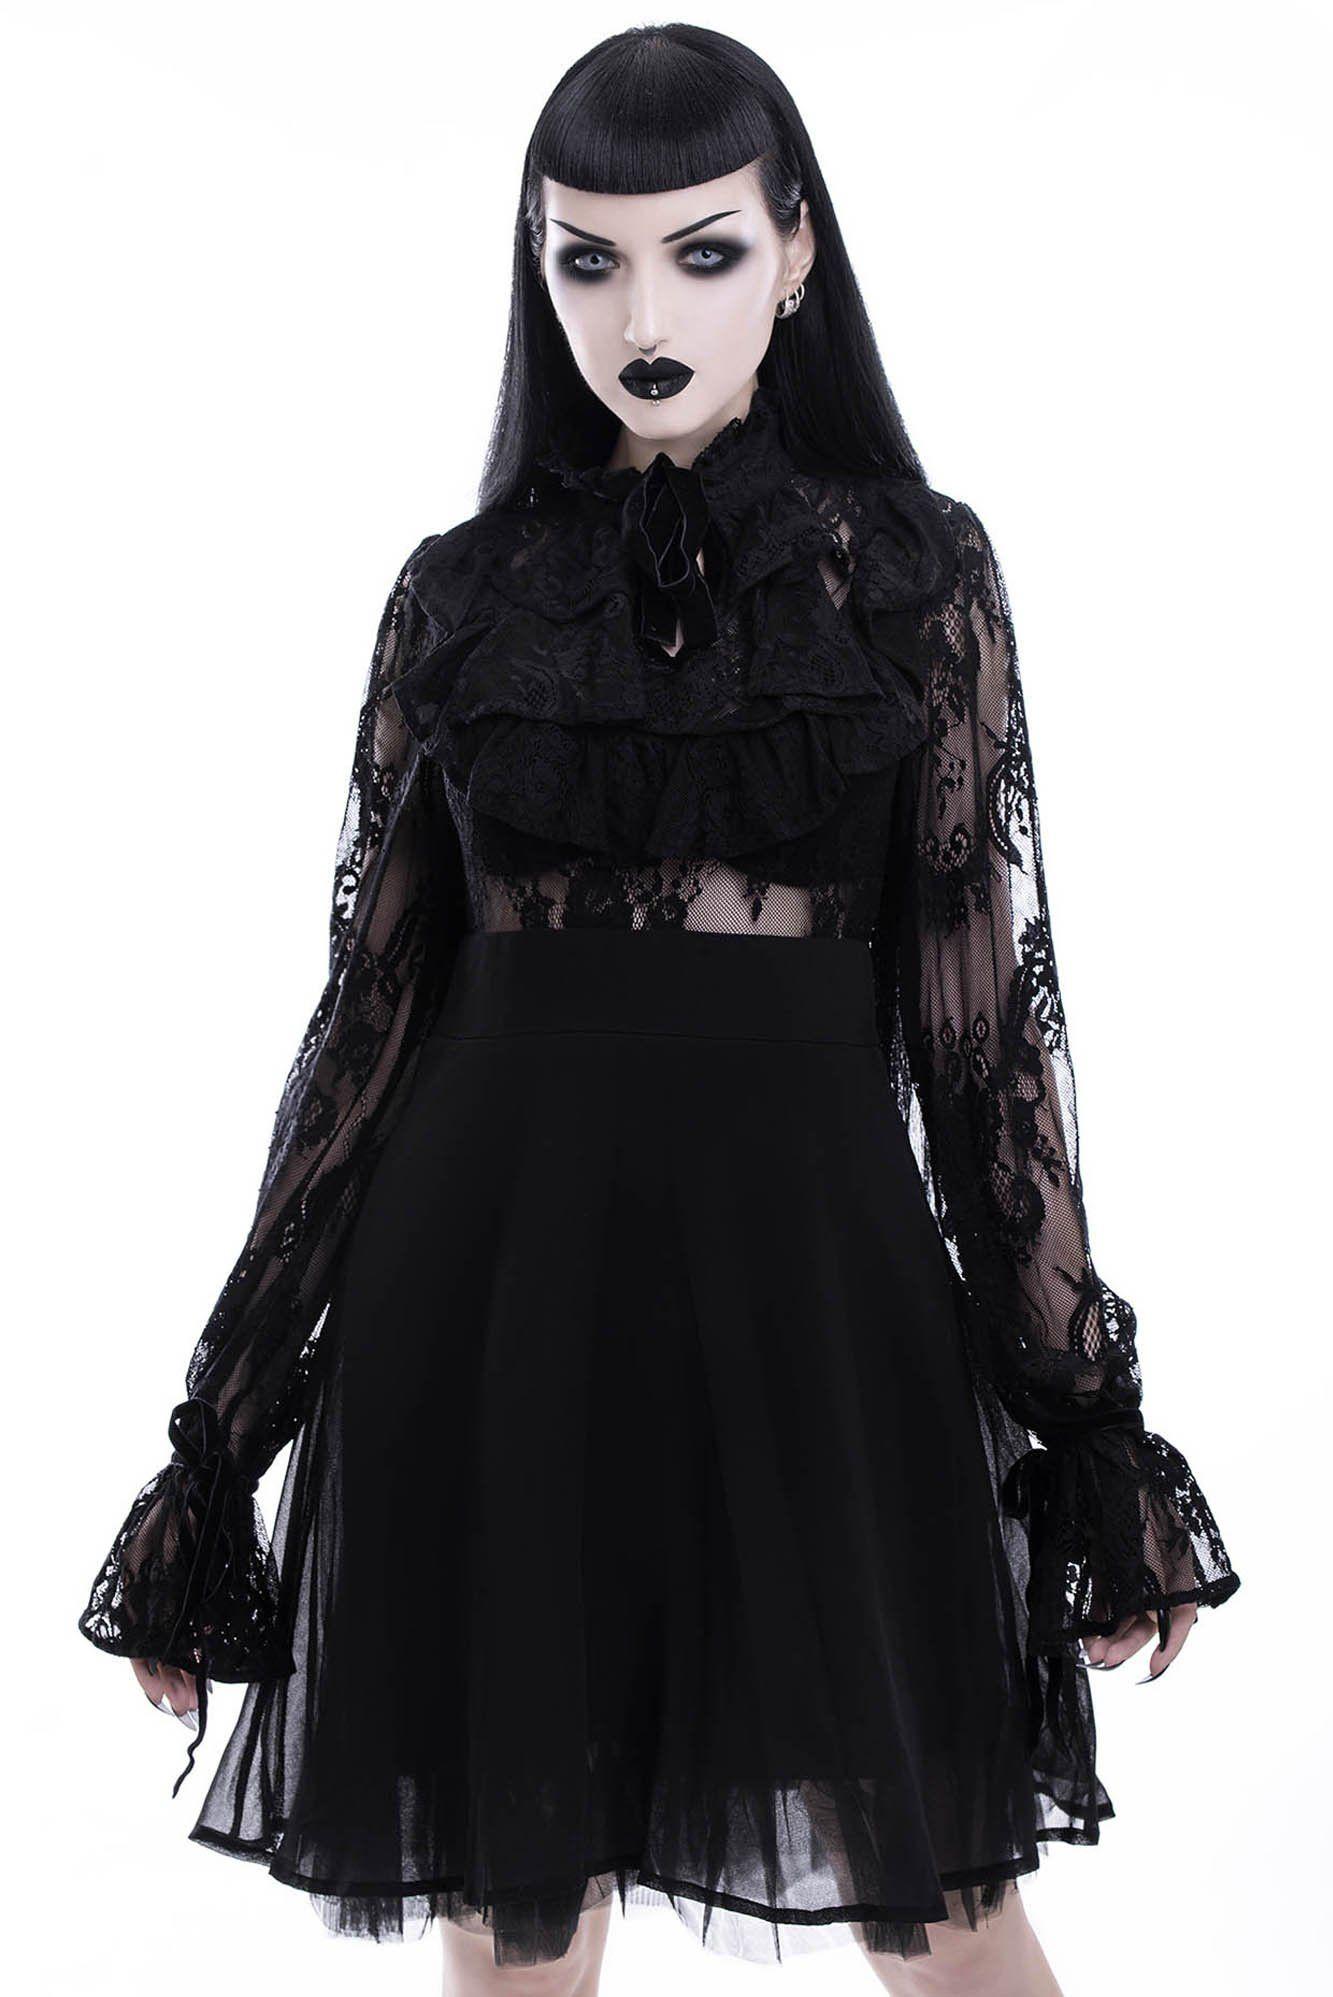 Afterlife Party Dress Shop Now Killstar Com Killstar Uk Store Party Dress Killstar Dress Lace Skater Dress [ 1997 x 1333 Pixel ]